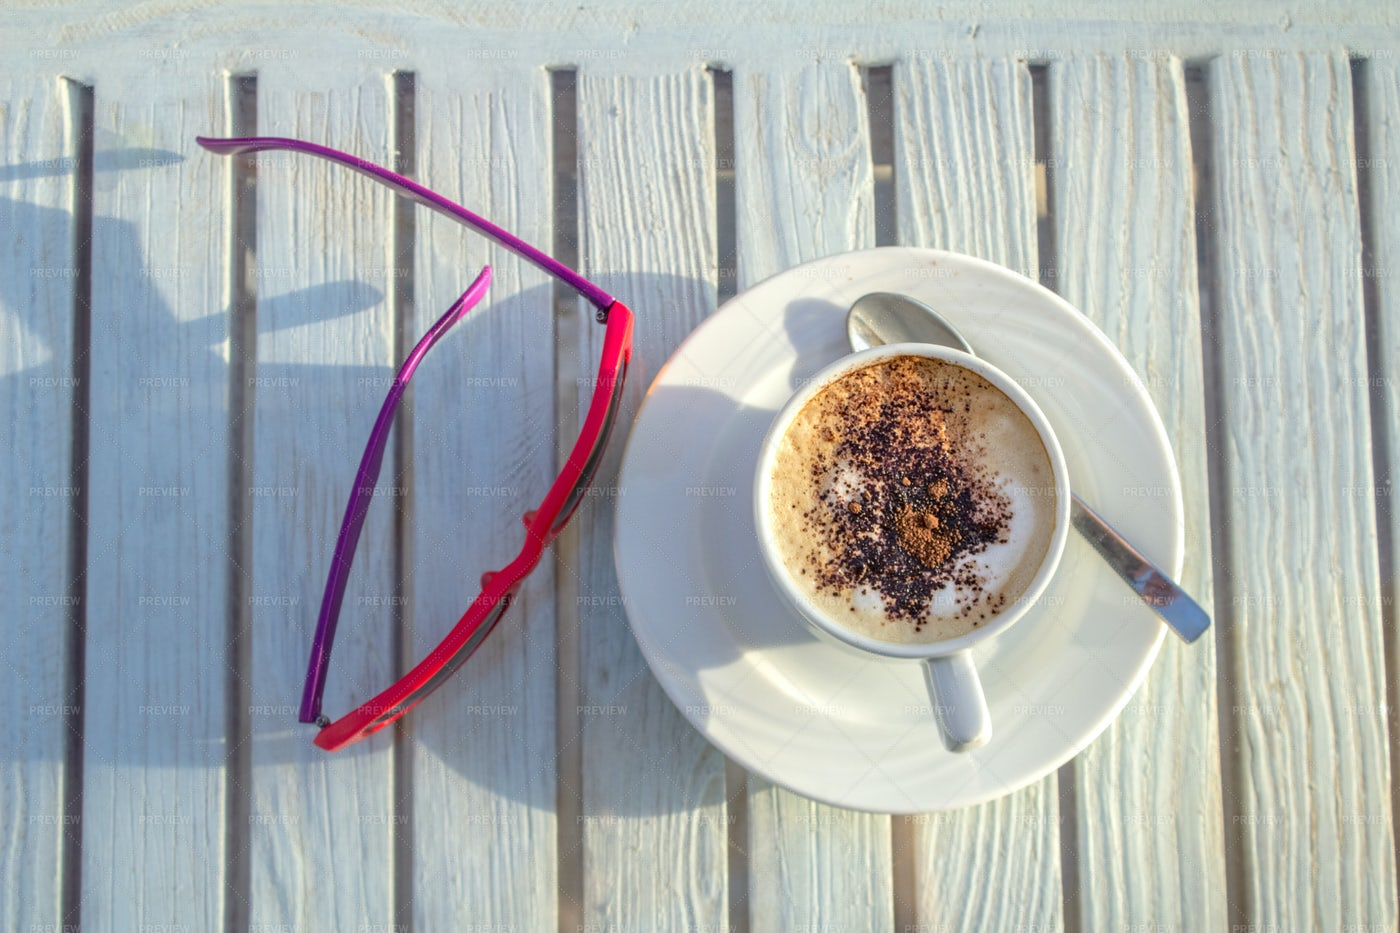 Cappuccino And Sunglasses: Stock Photos